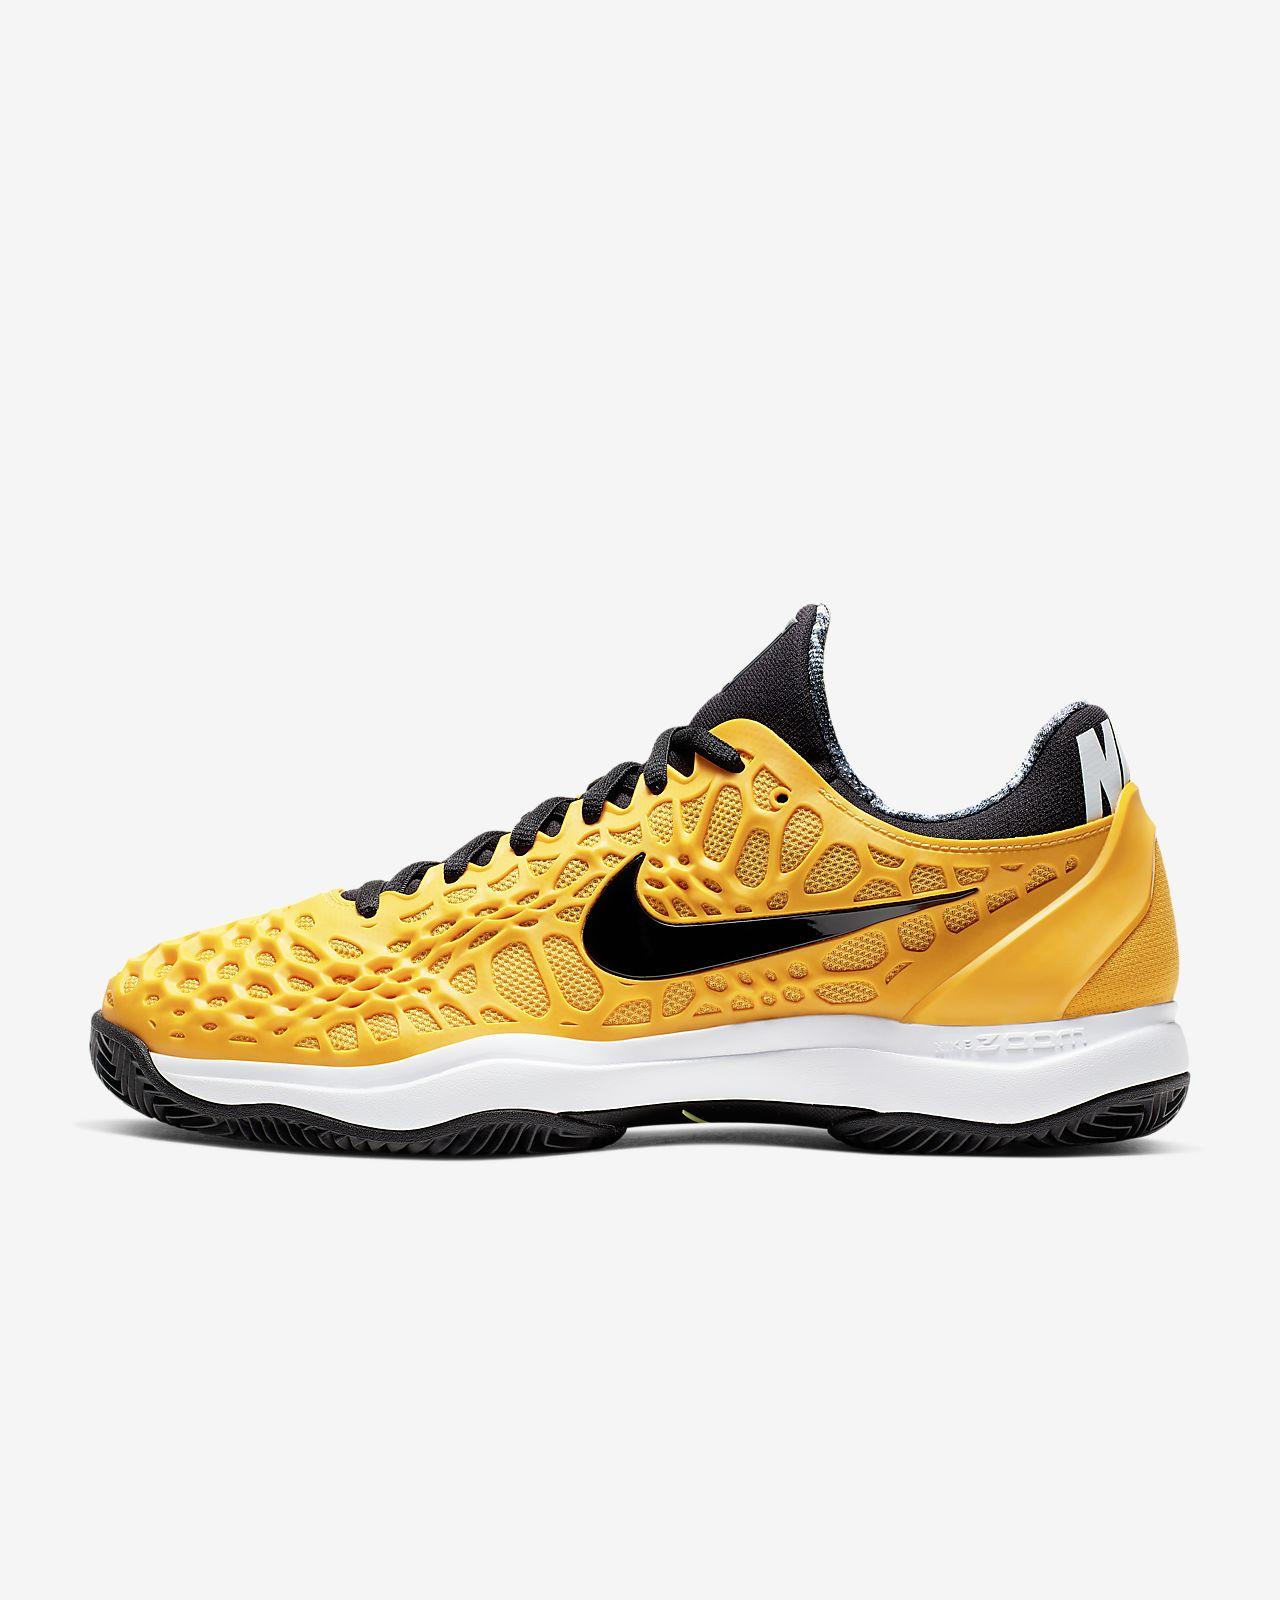 Tennissko Nike Zoom Cage 3 Clay för män